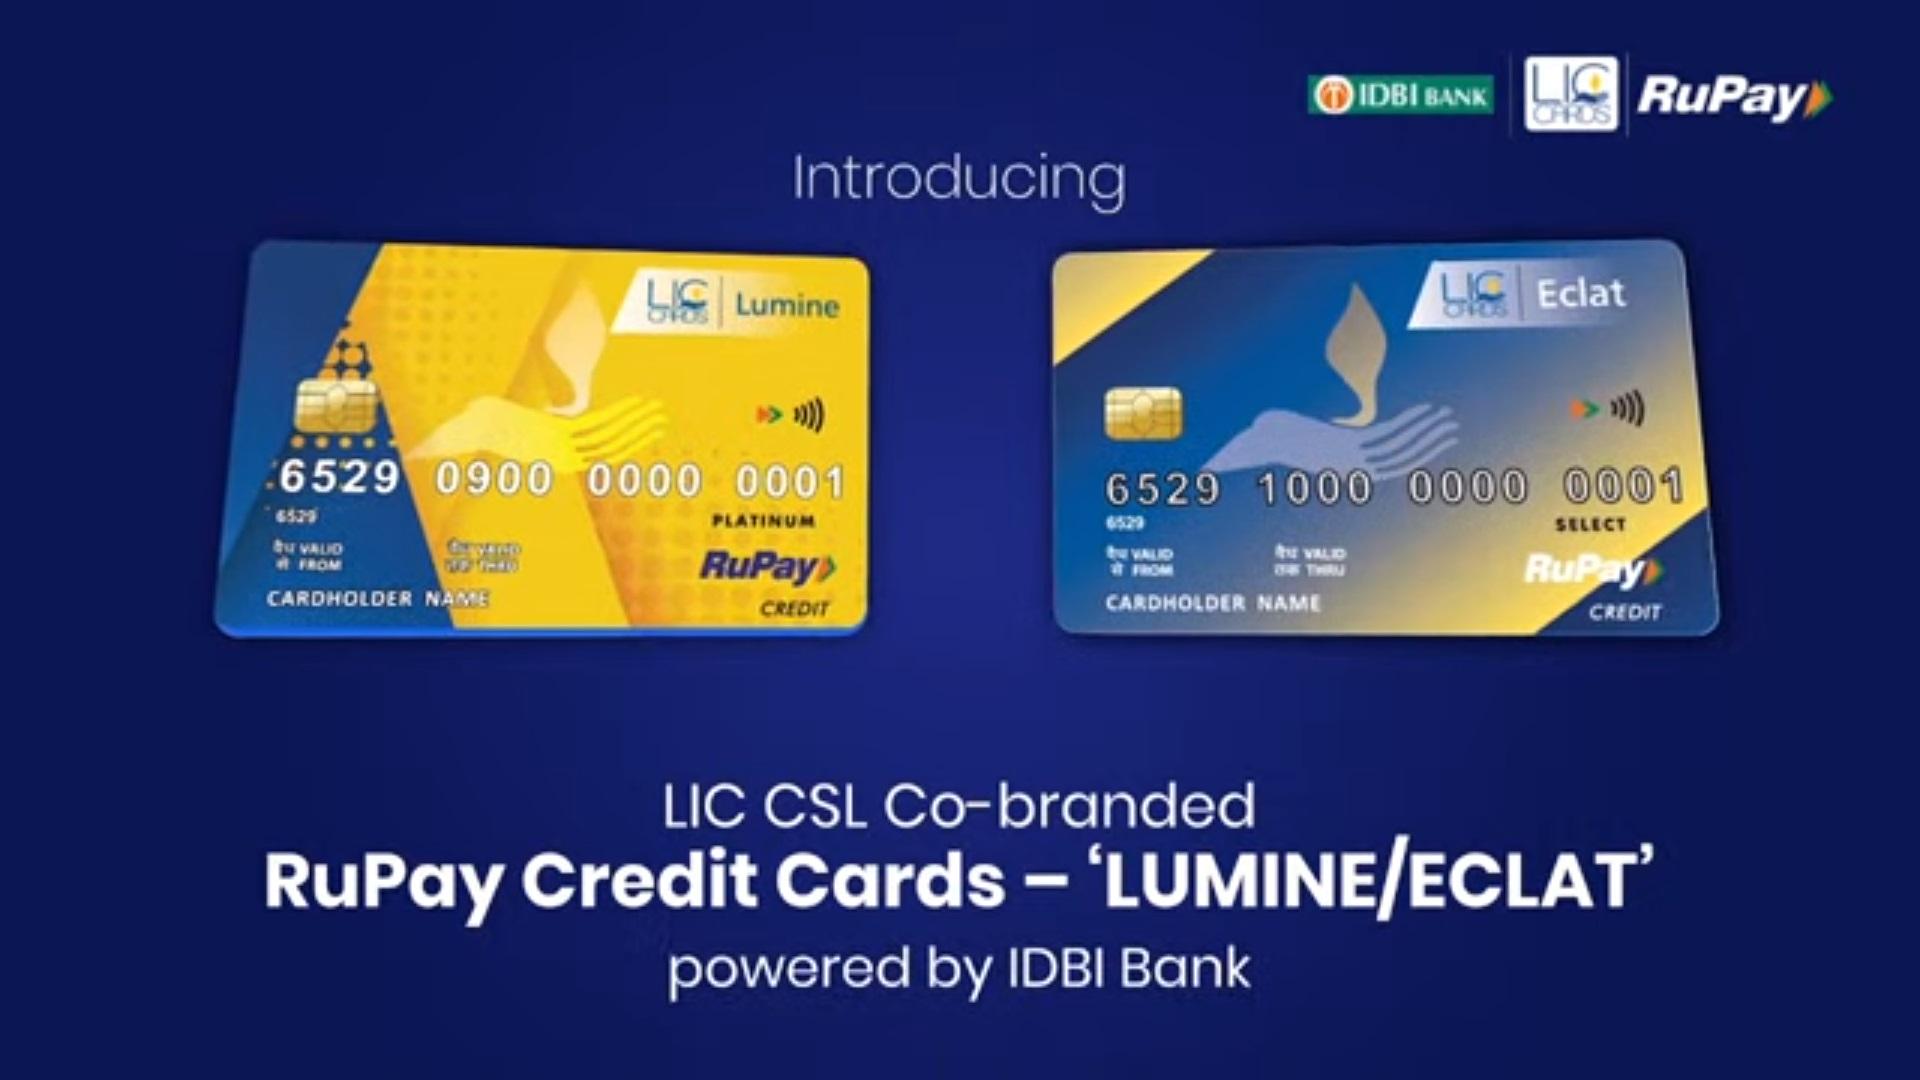 LIC IDBI Lumine and Eclat Rupay Credit Cards